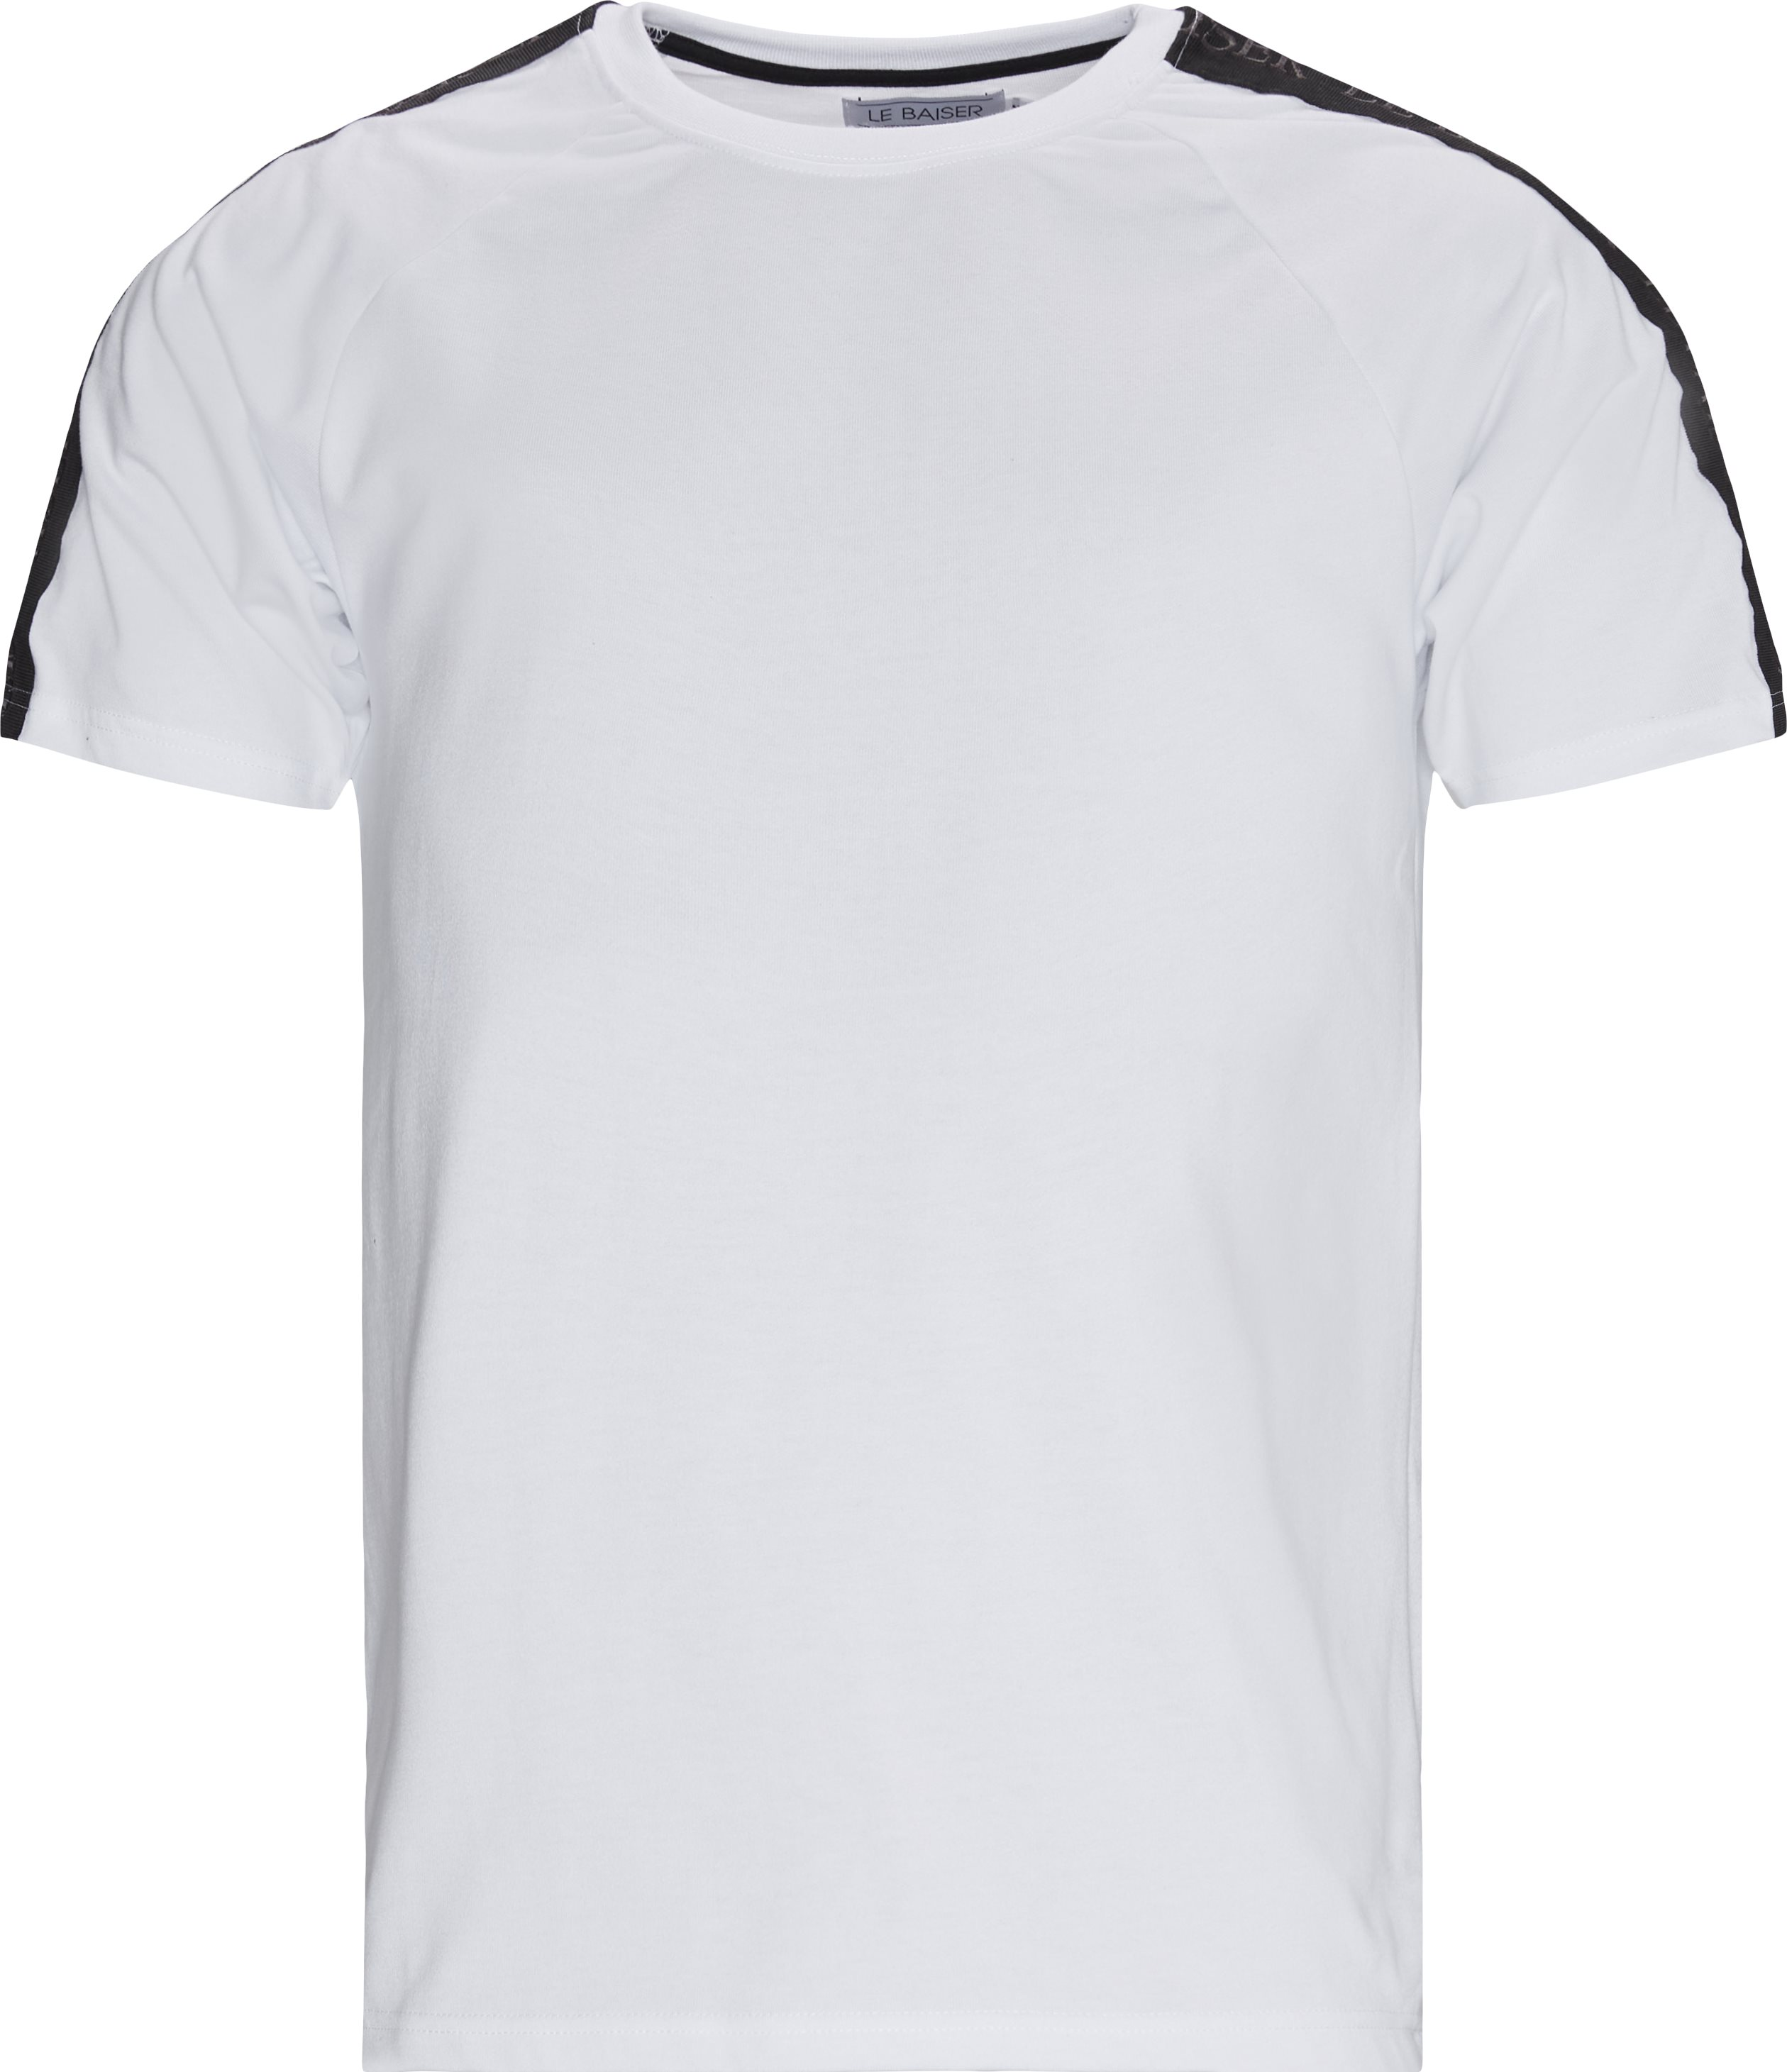 Menton Tee - T-shirts - Regular - Vit